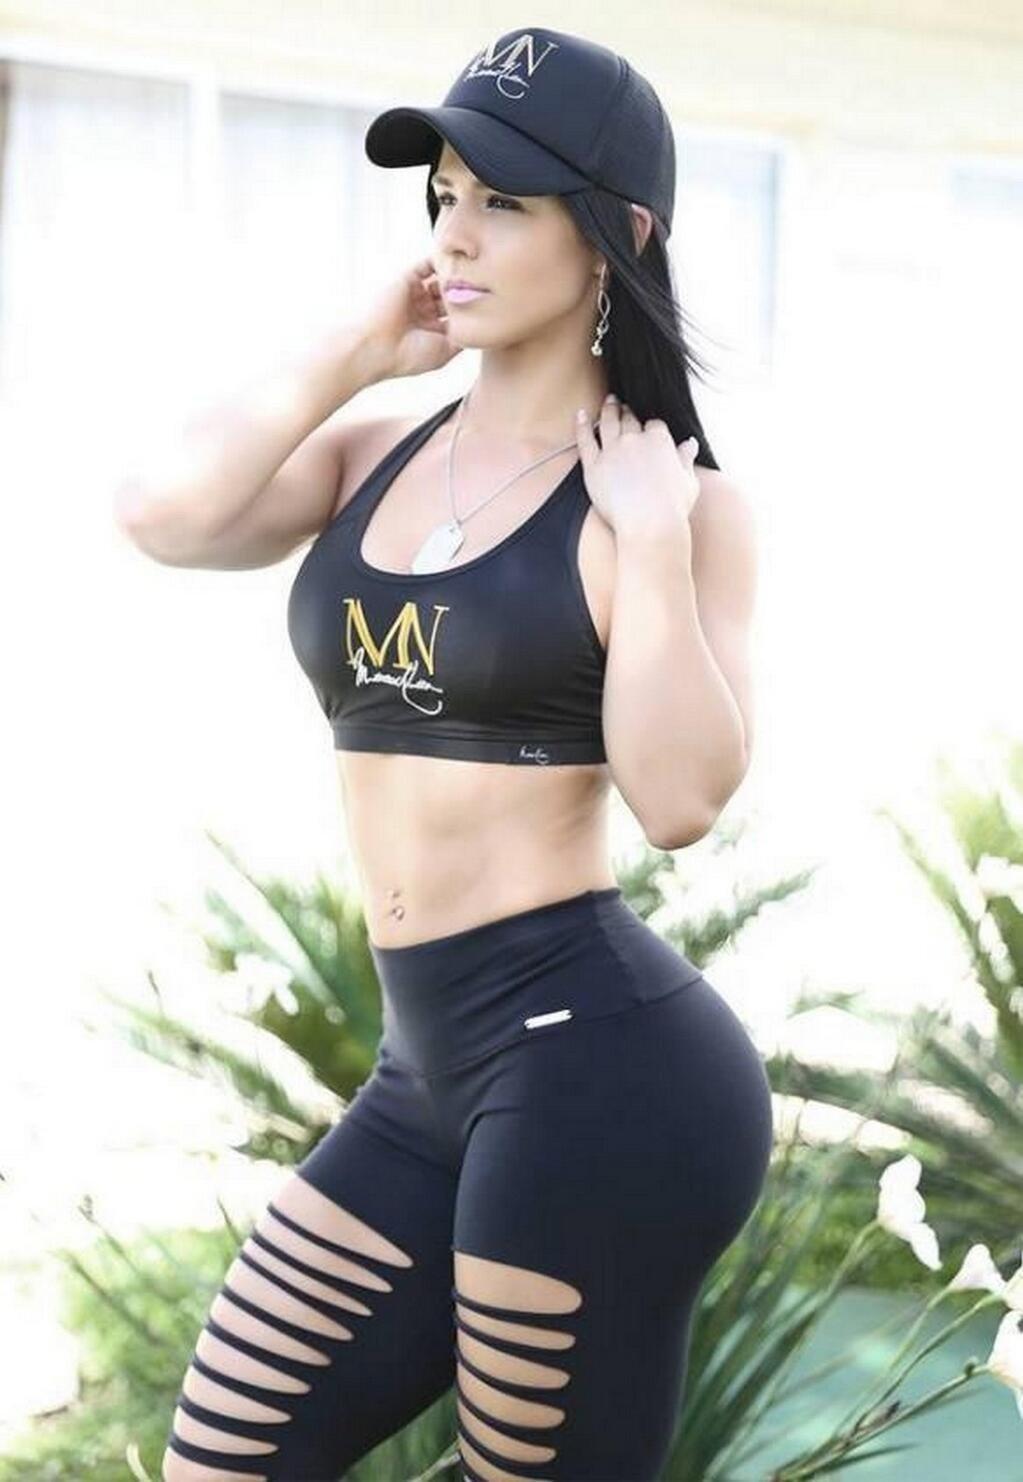 big booty girl public photo